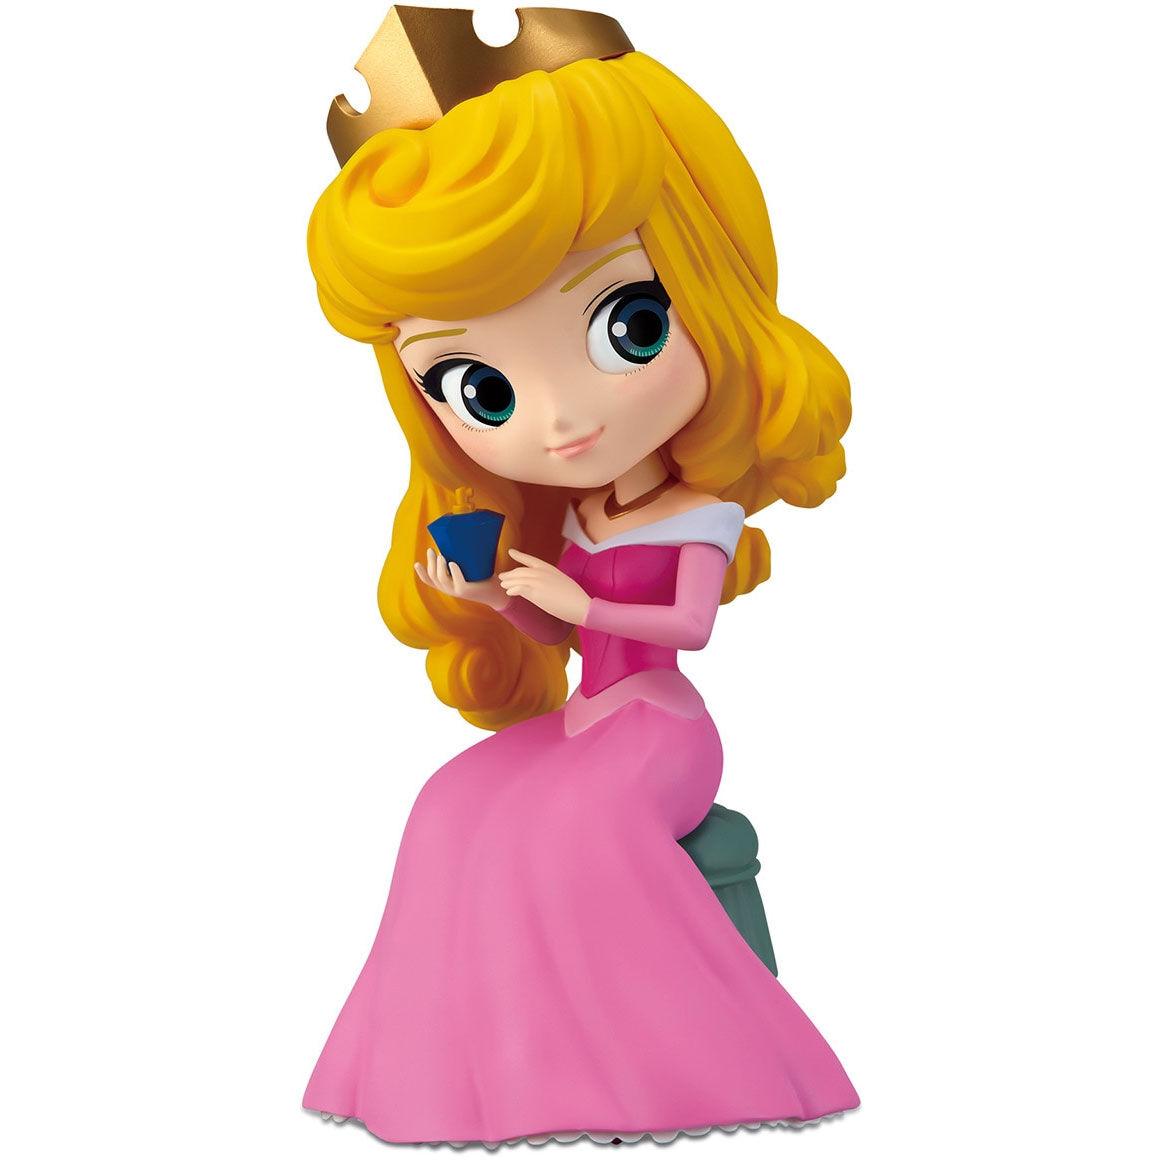 Figura Princesa Aurora Disney Character Q posket perfumagic A 12cm By Banpresto